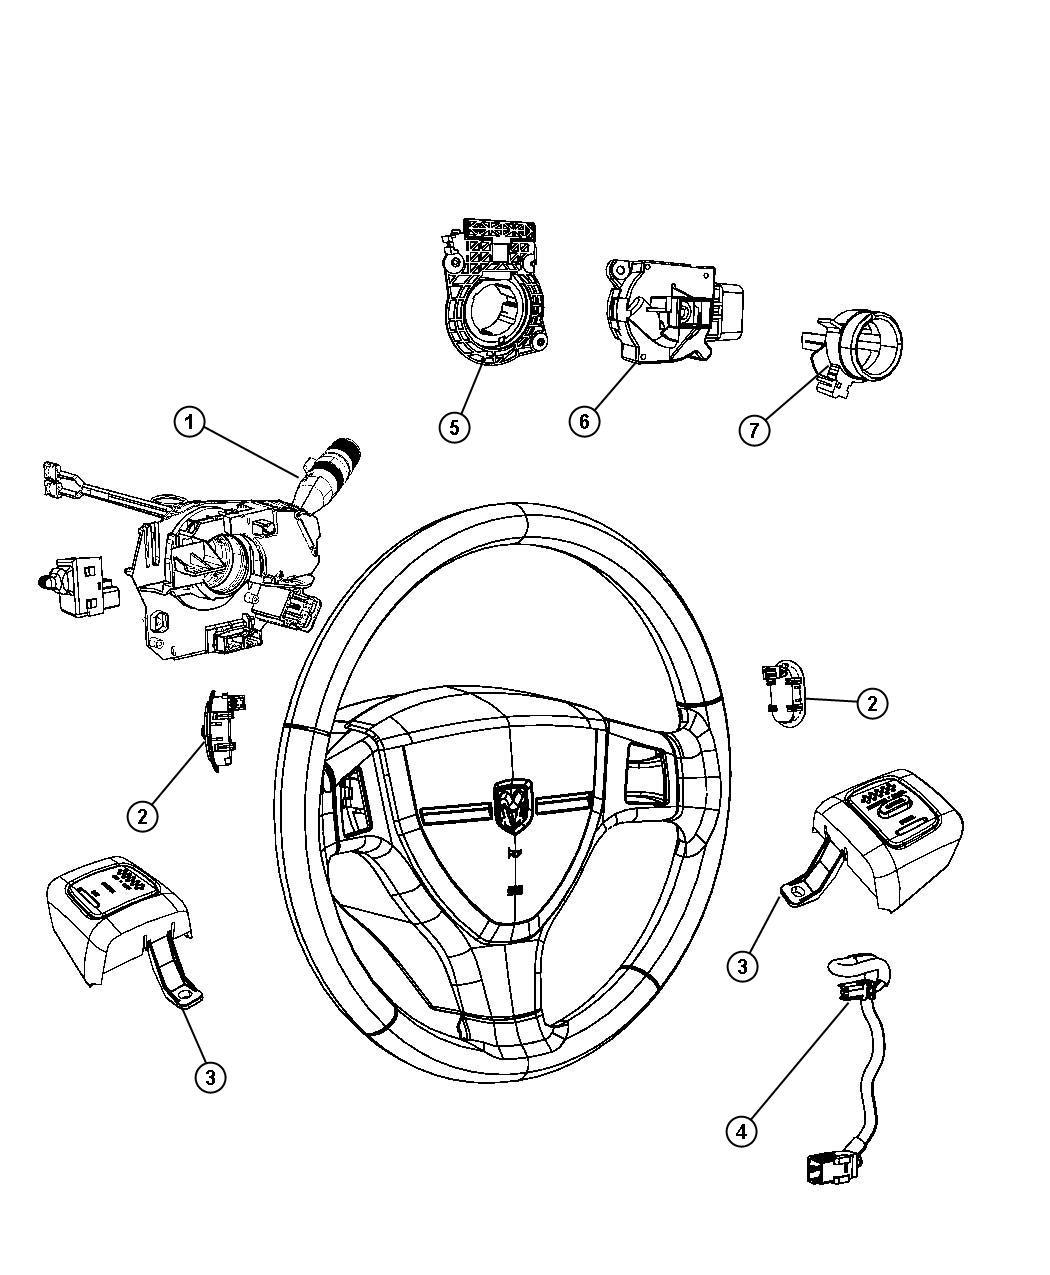 Chrysler Town & Country Wiring. Radio adapter, steering